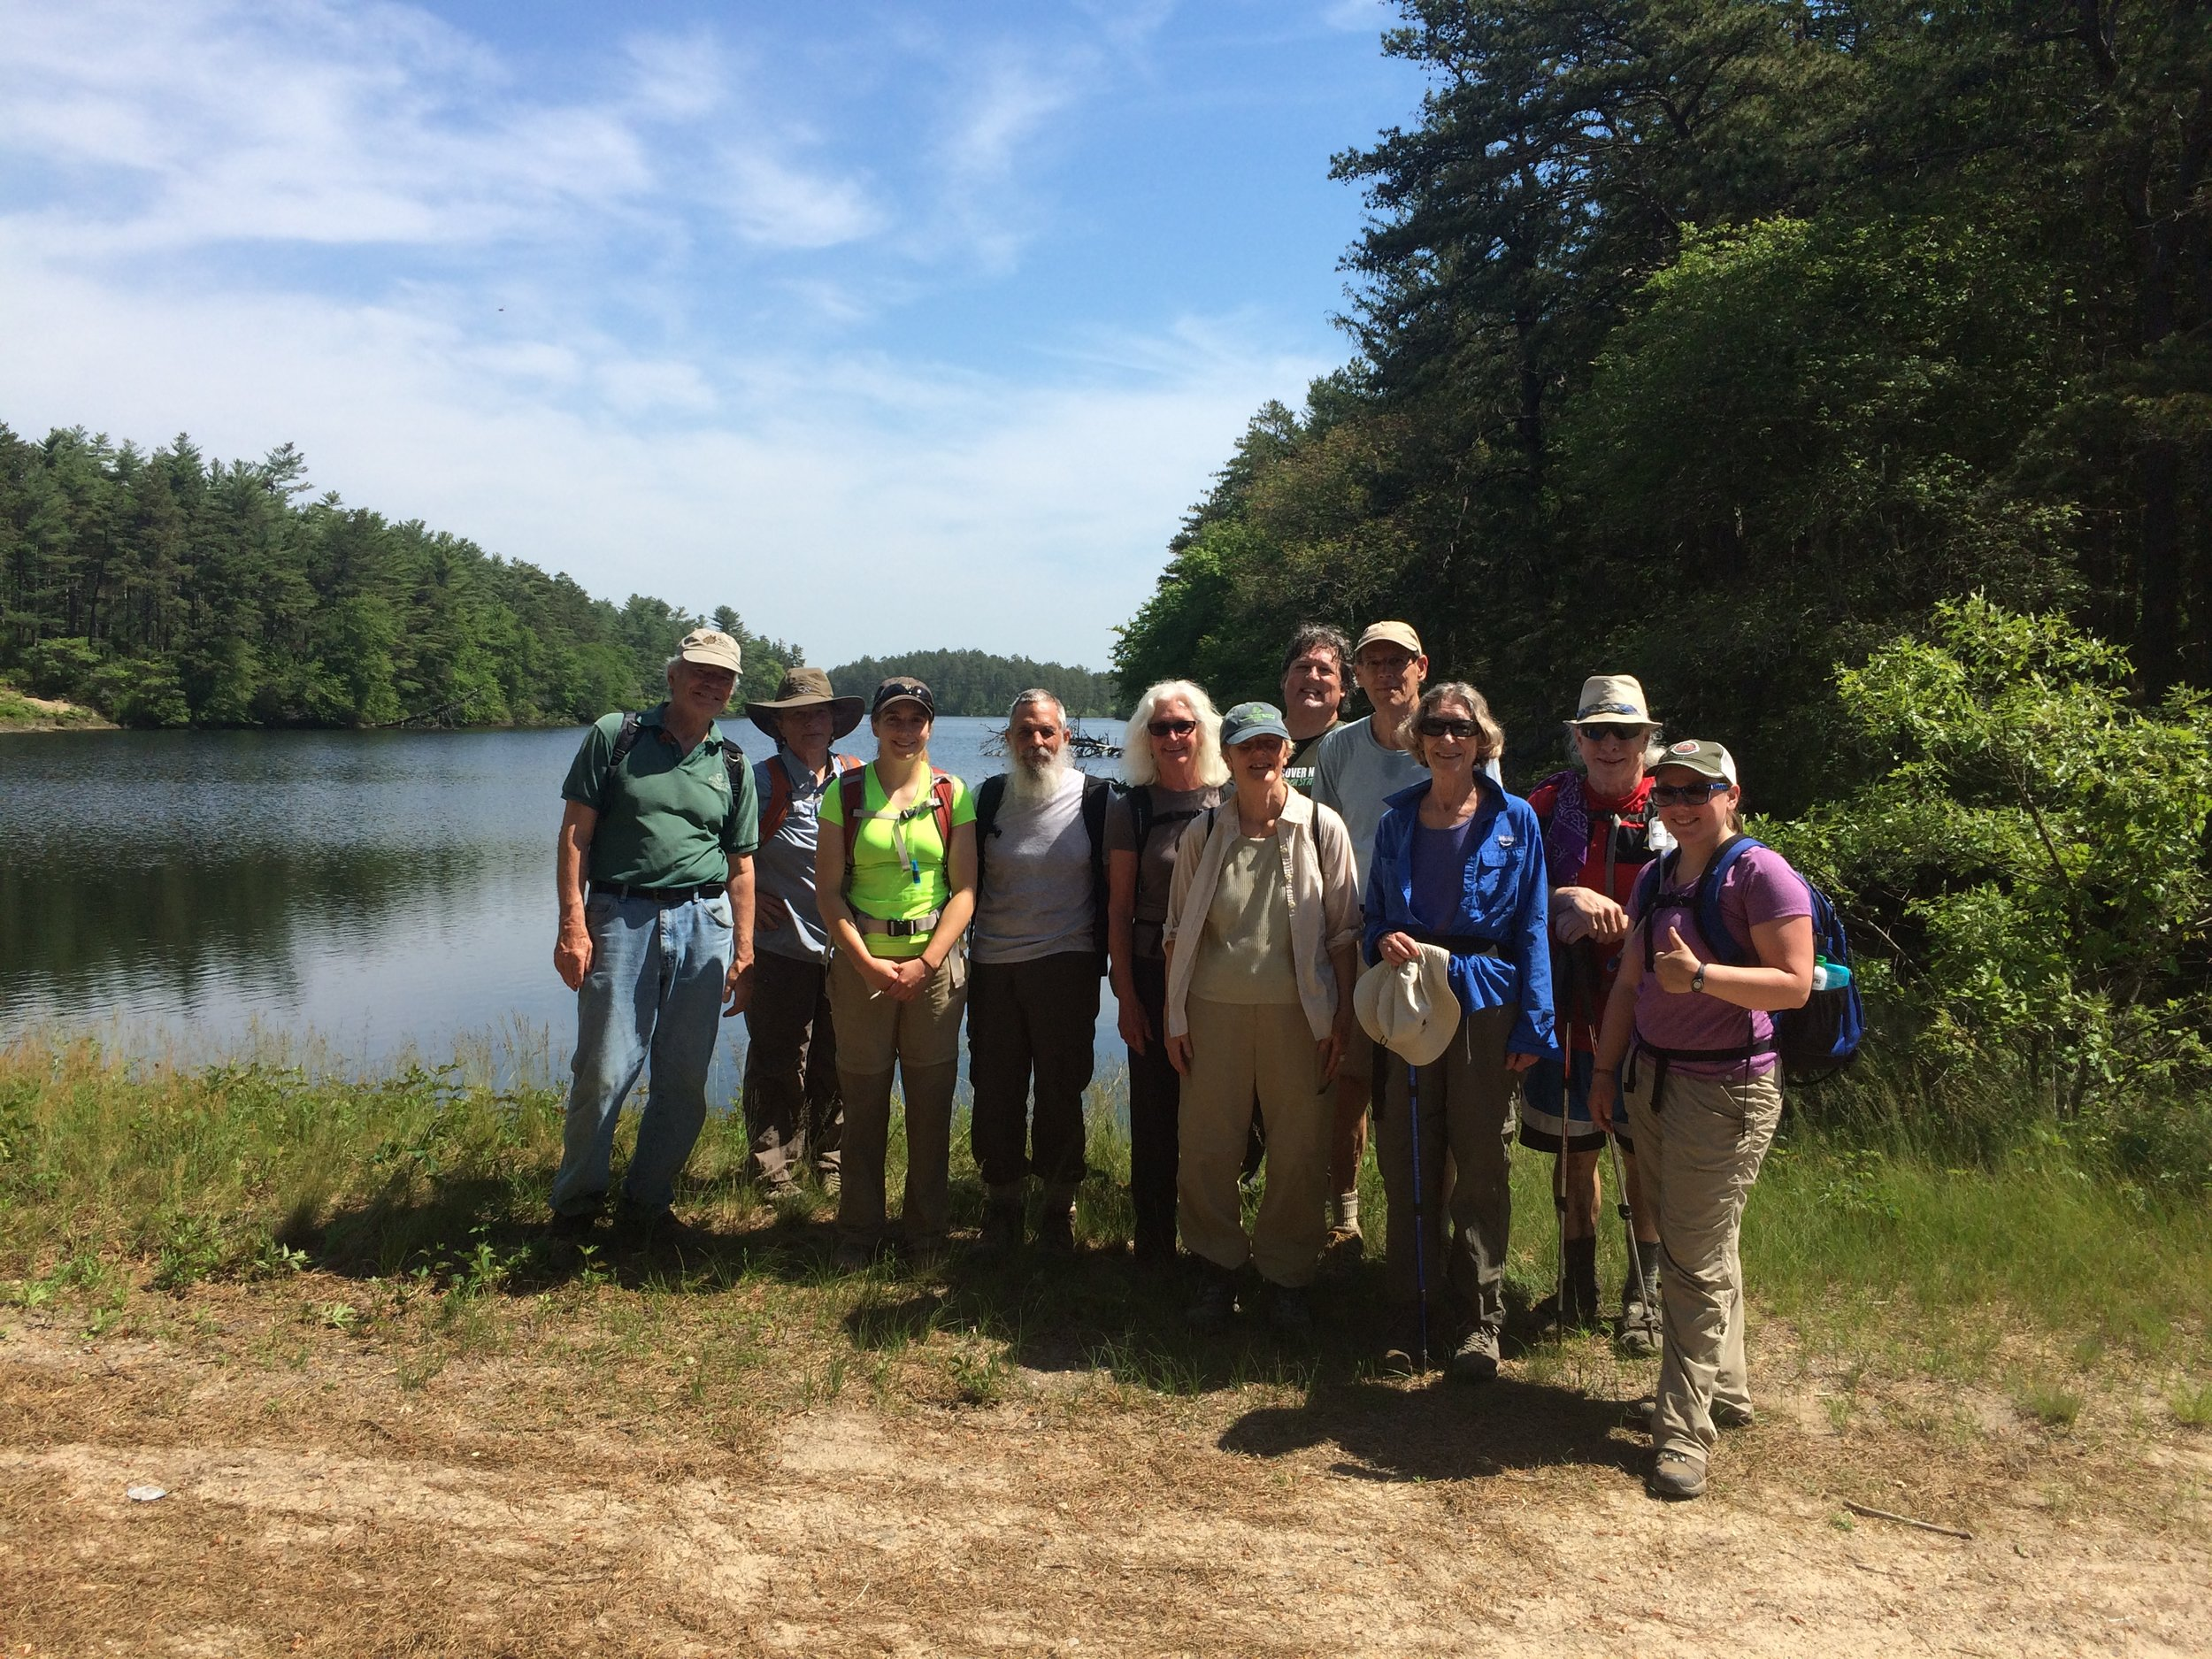 The Part II Crew (minus Scott) at Frogfoot Reservoir